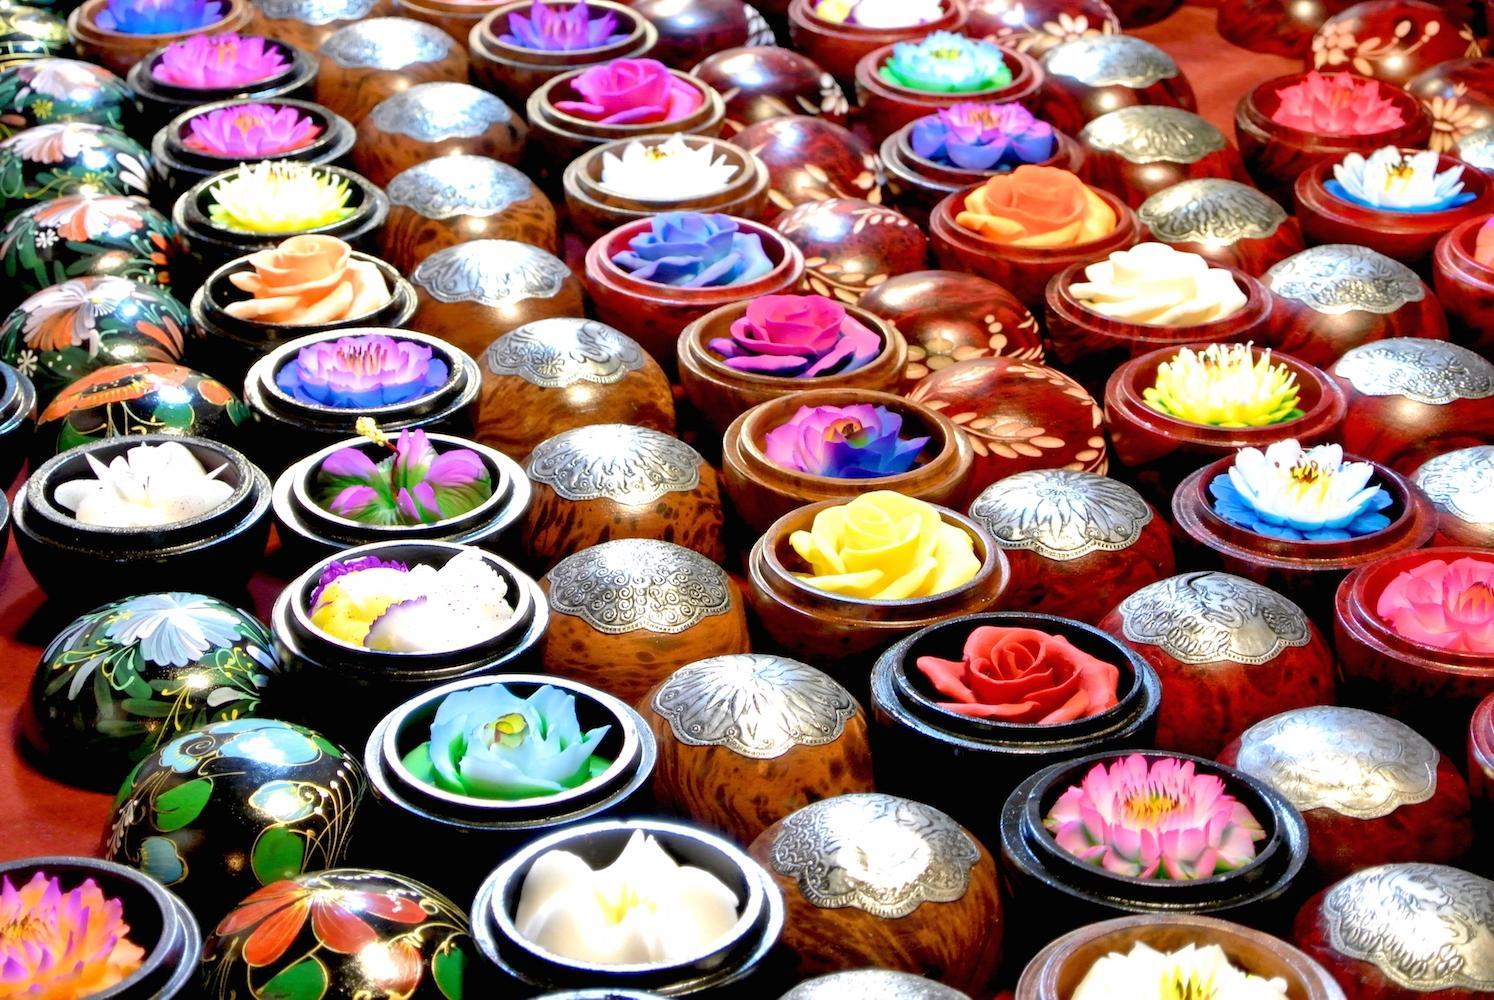 Фото сувениров из Таиланда